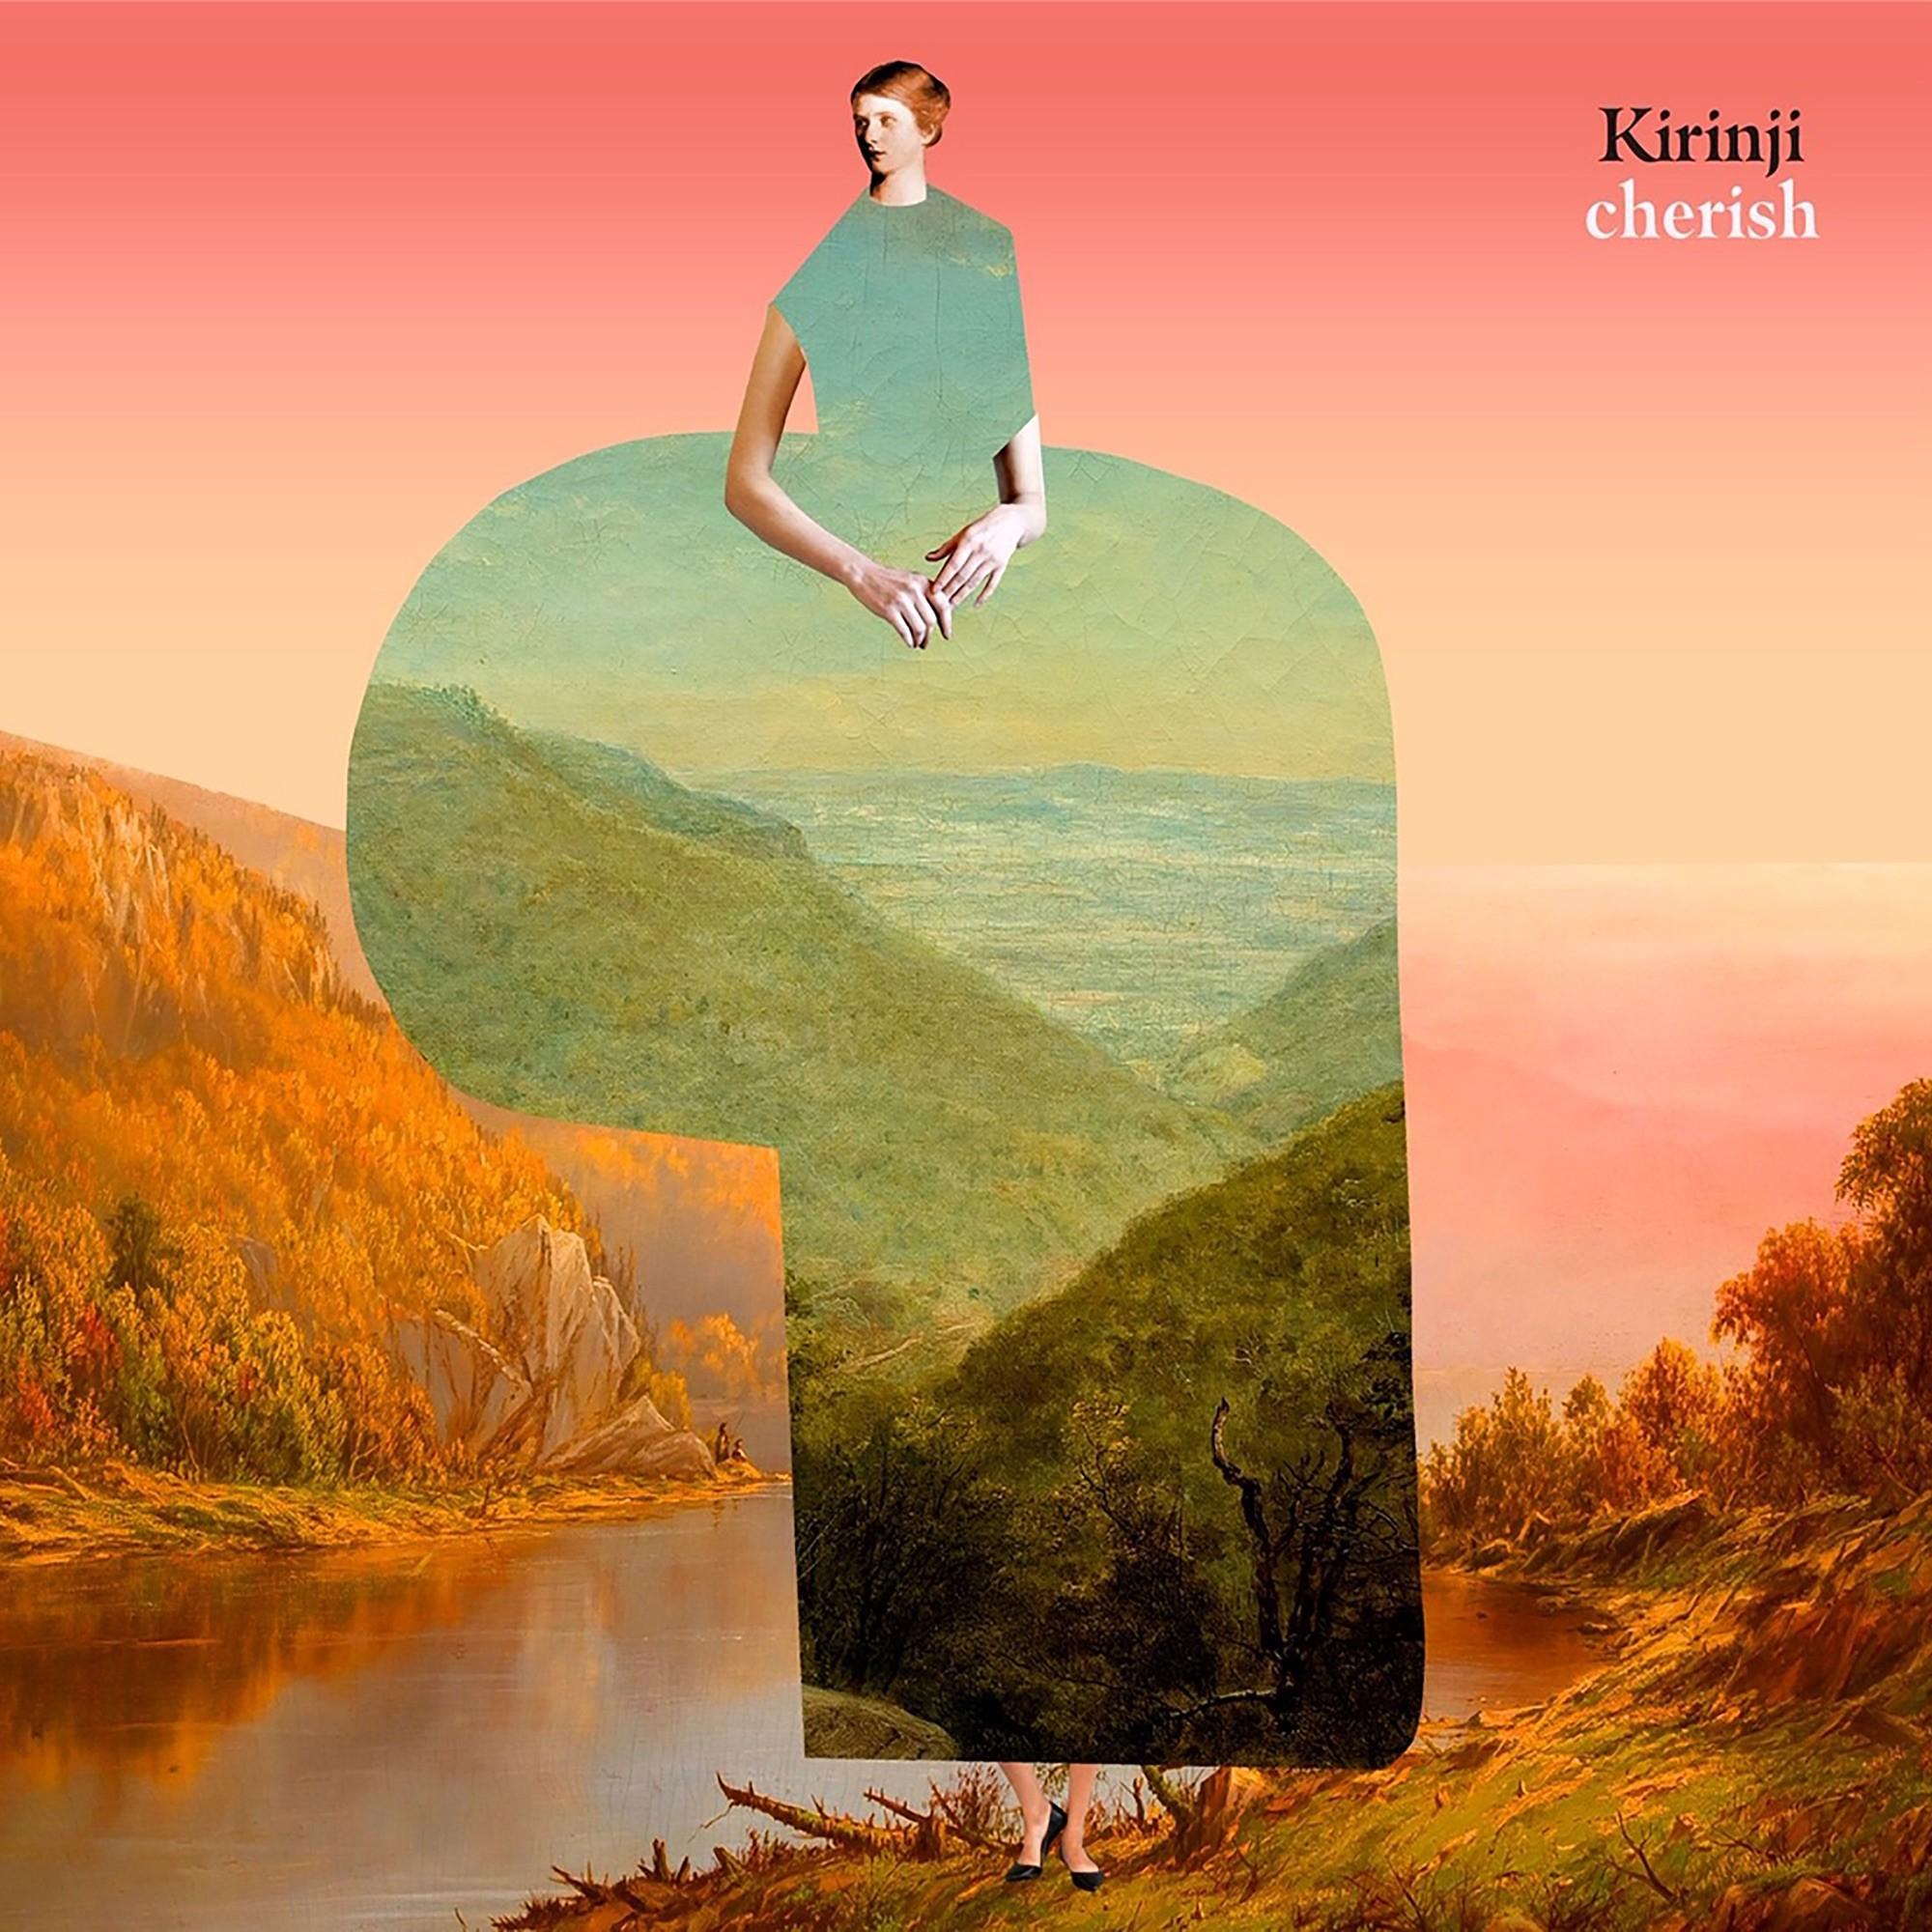 KIRINJI (キリンジ) – Cherish [24bit Lossless + AAC / WEB] [2019.11.20]